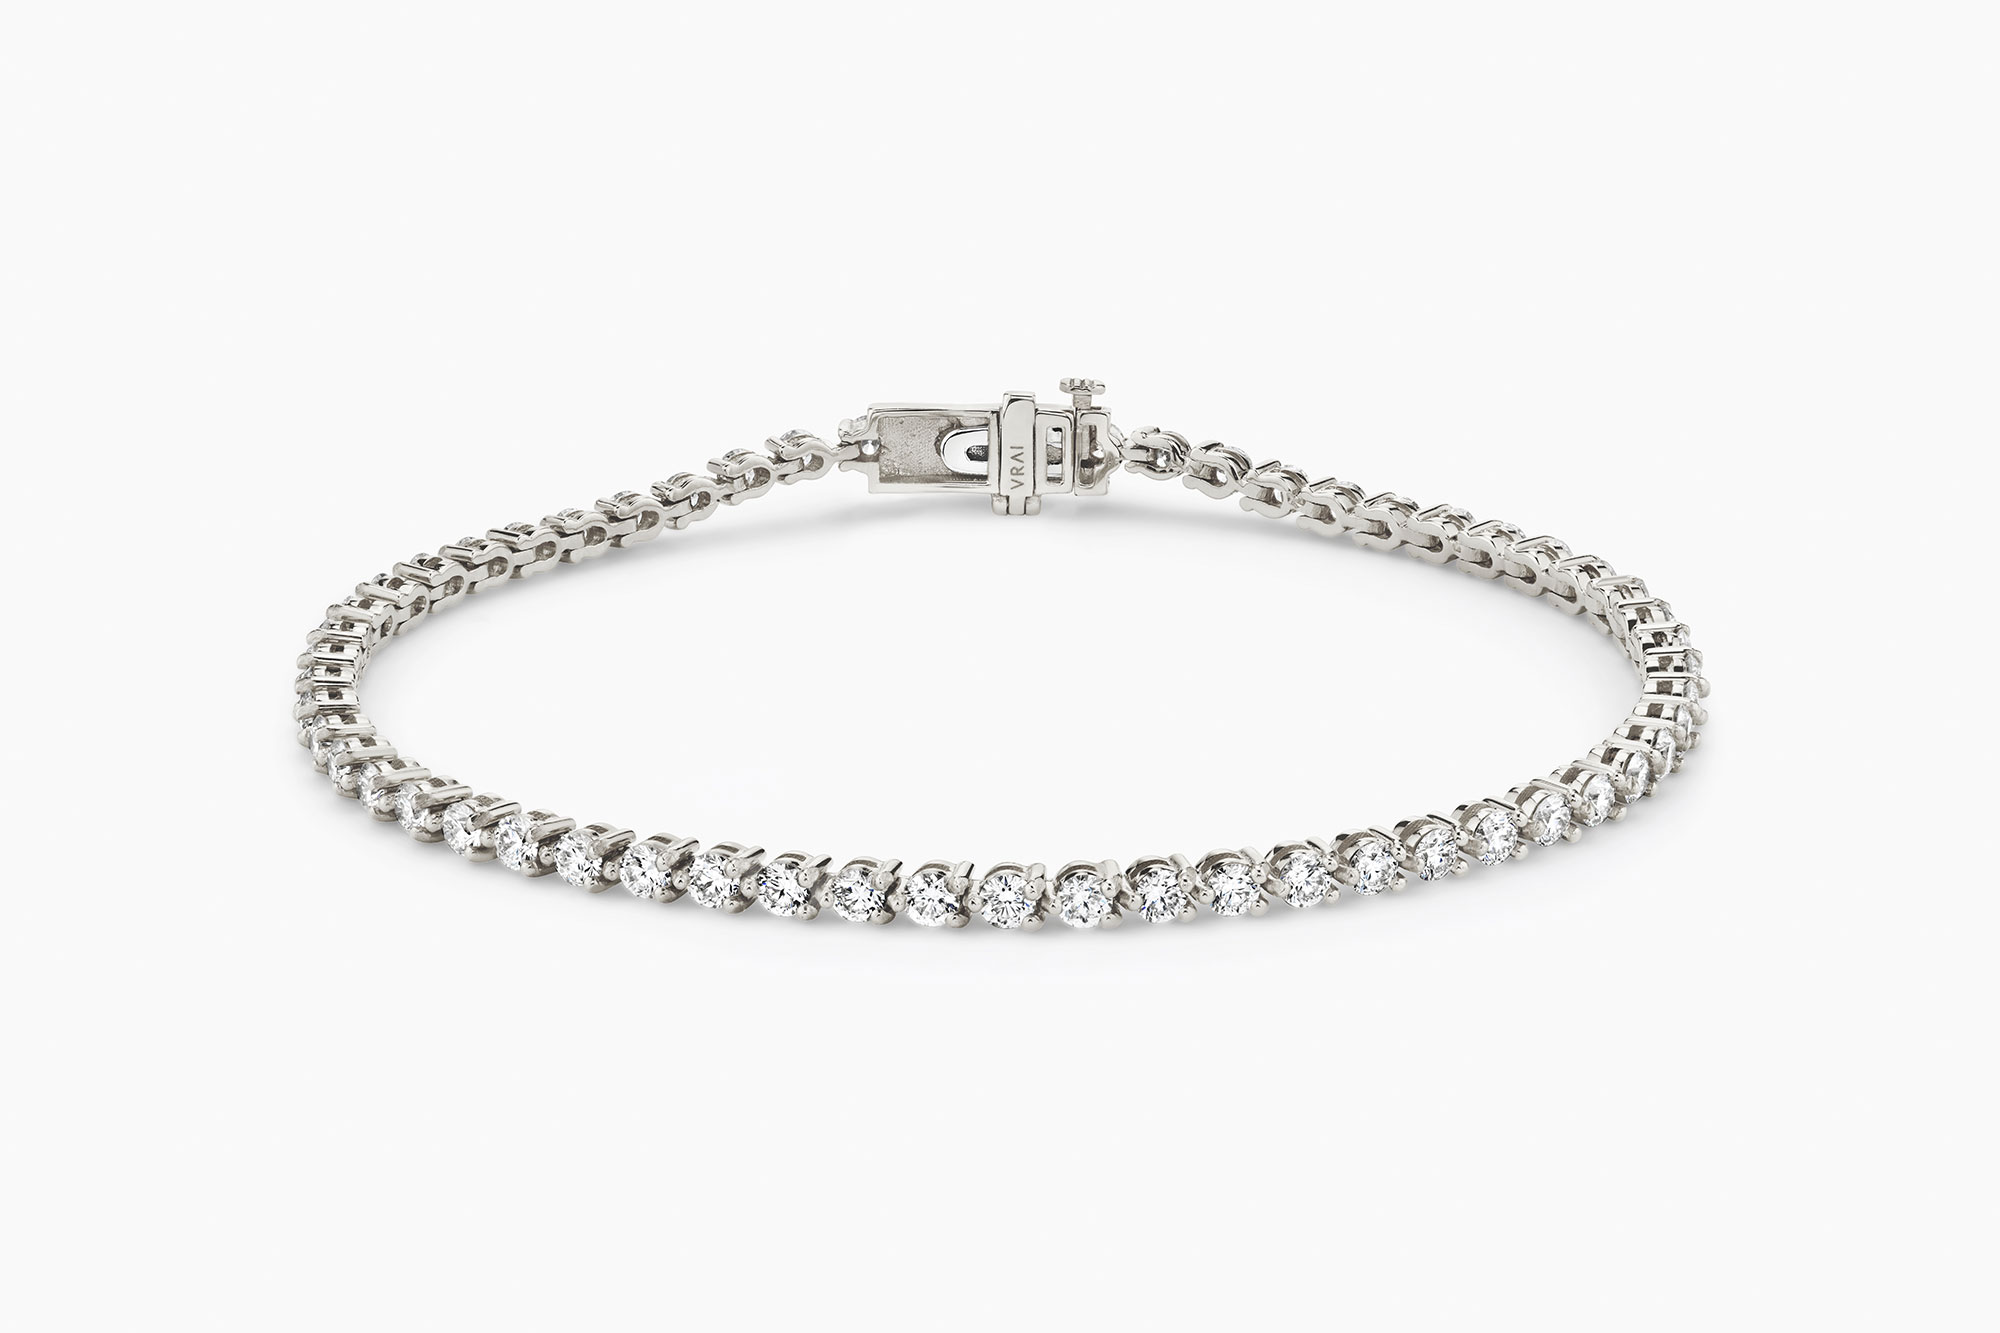 lab-grown diamonds, tennis bracelet, summer style